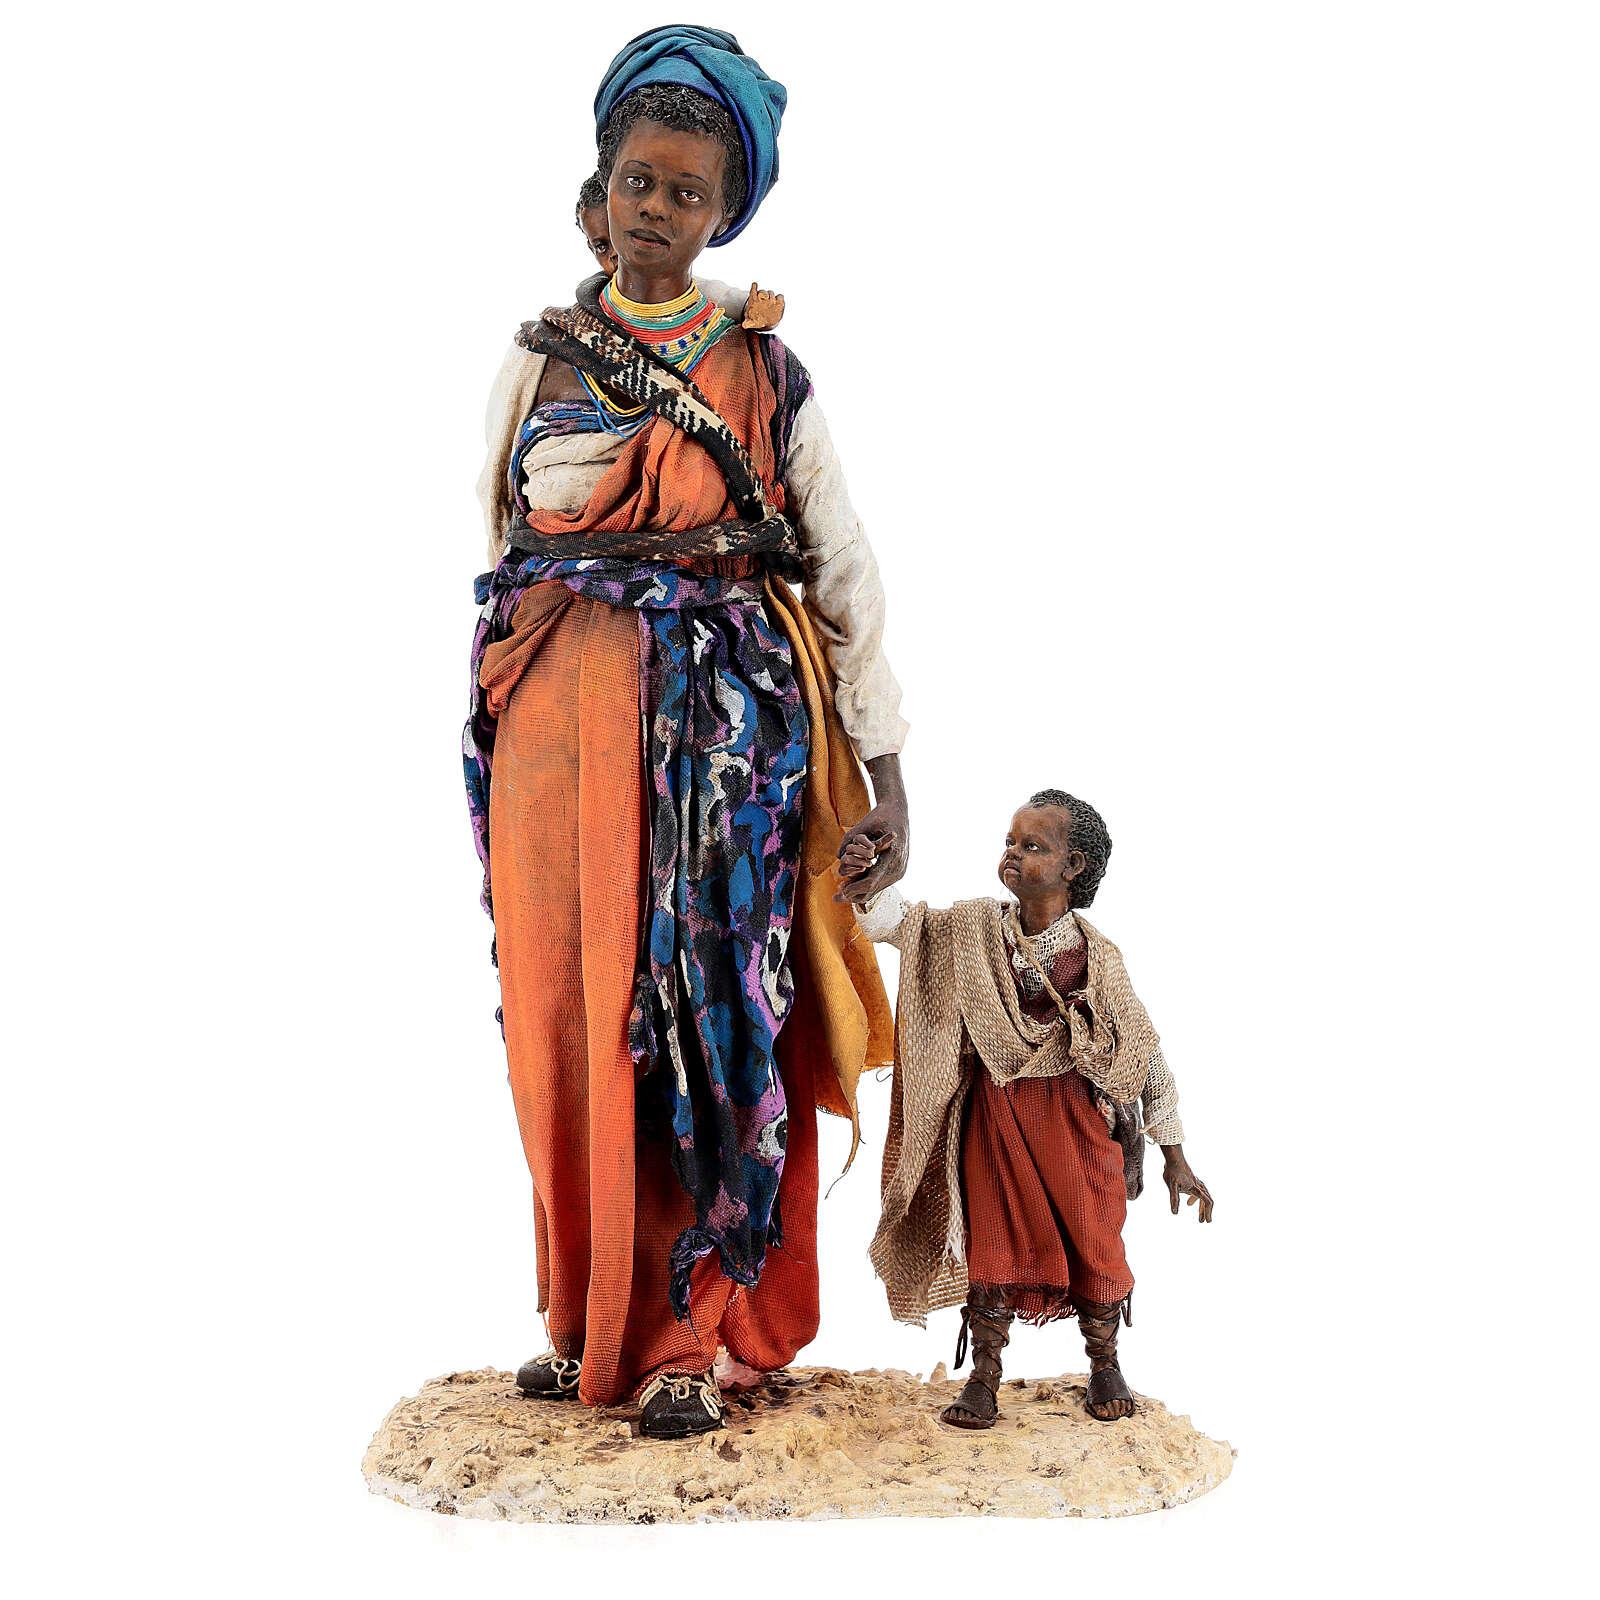 Mujer morena con niño mano 30 cm, Tripi 4